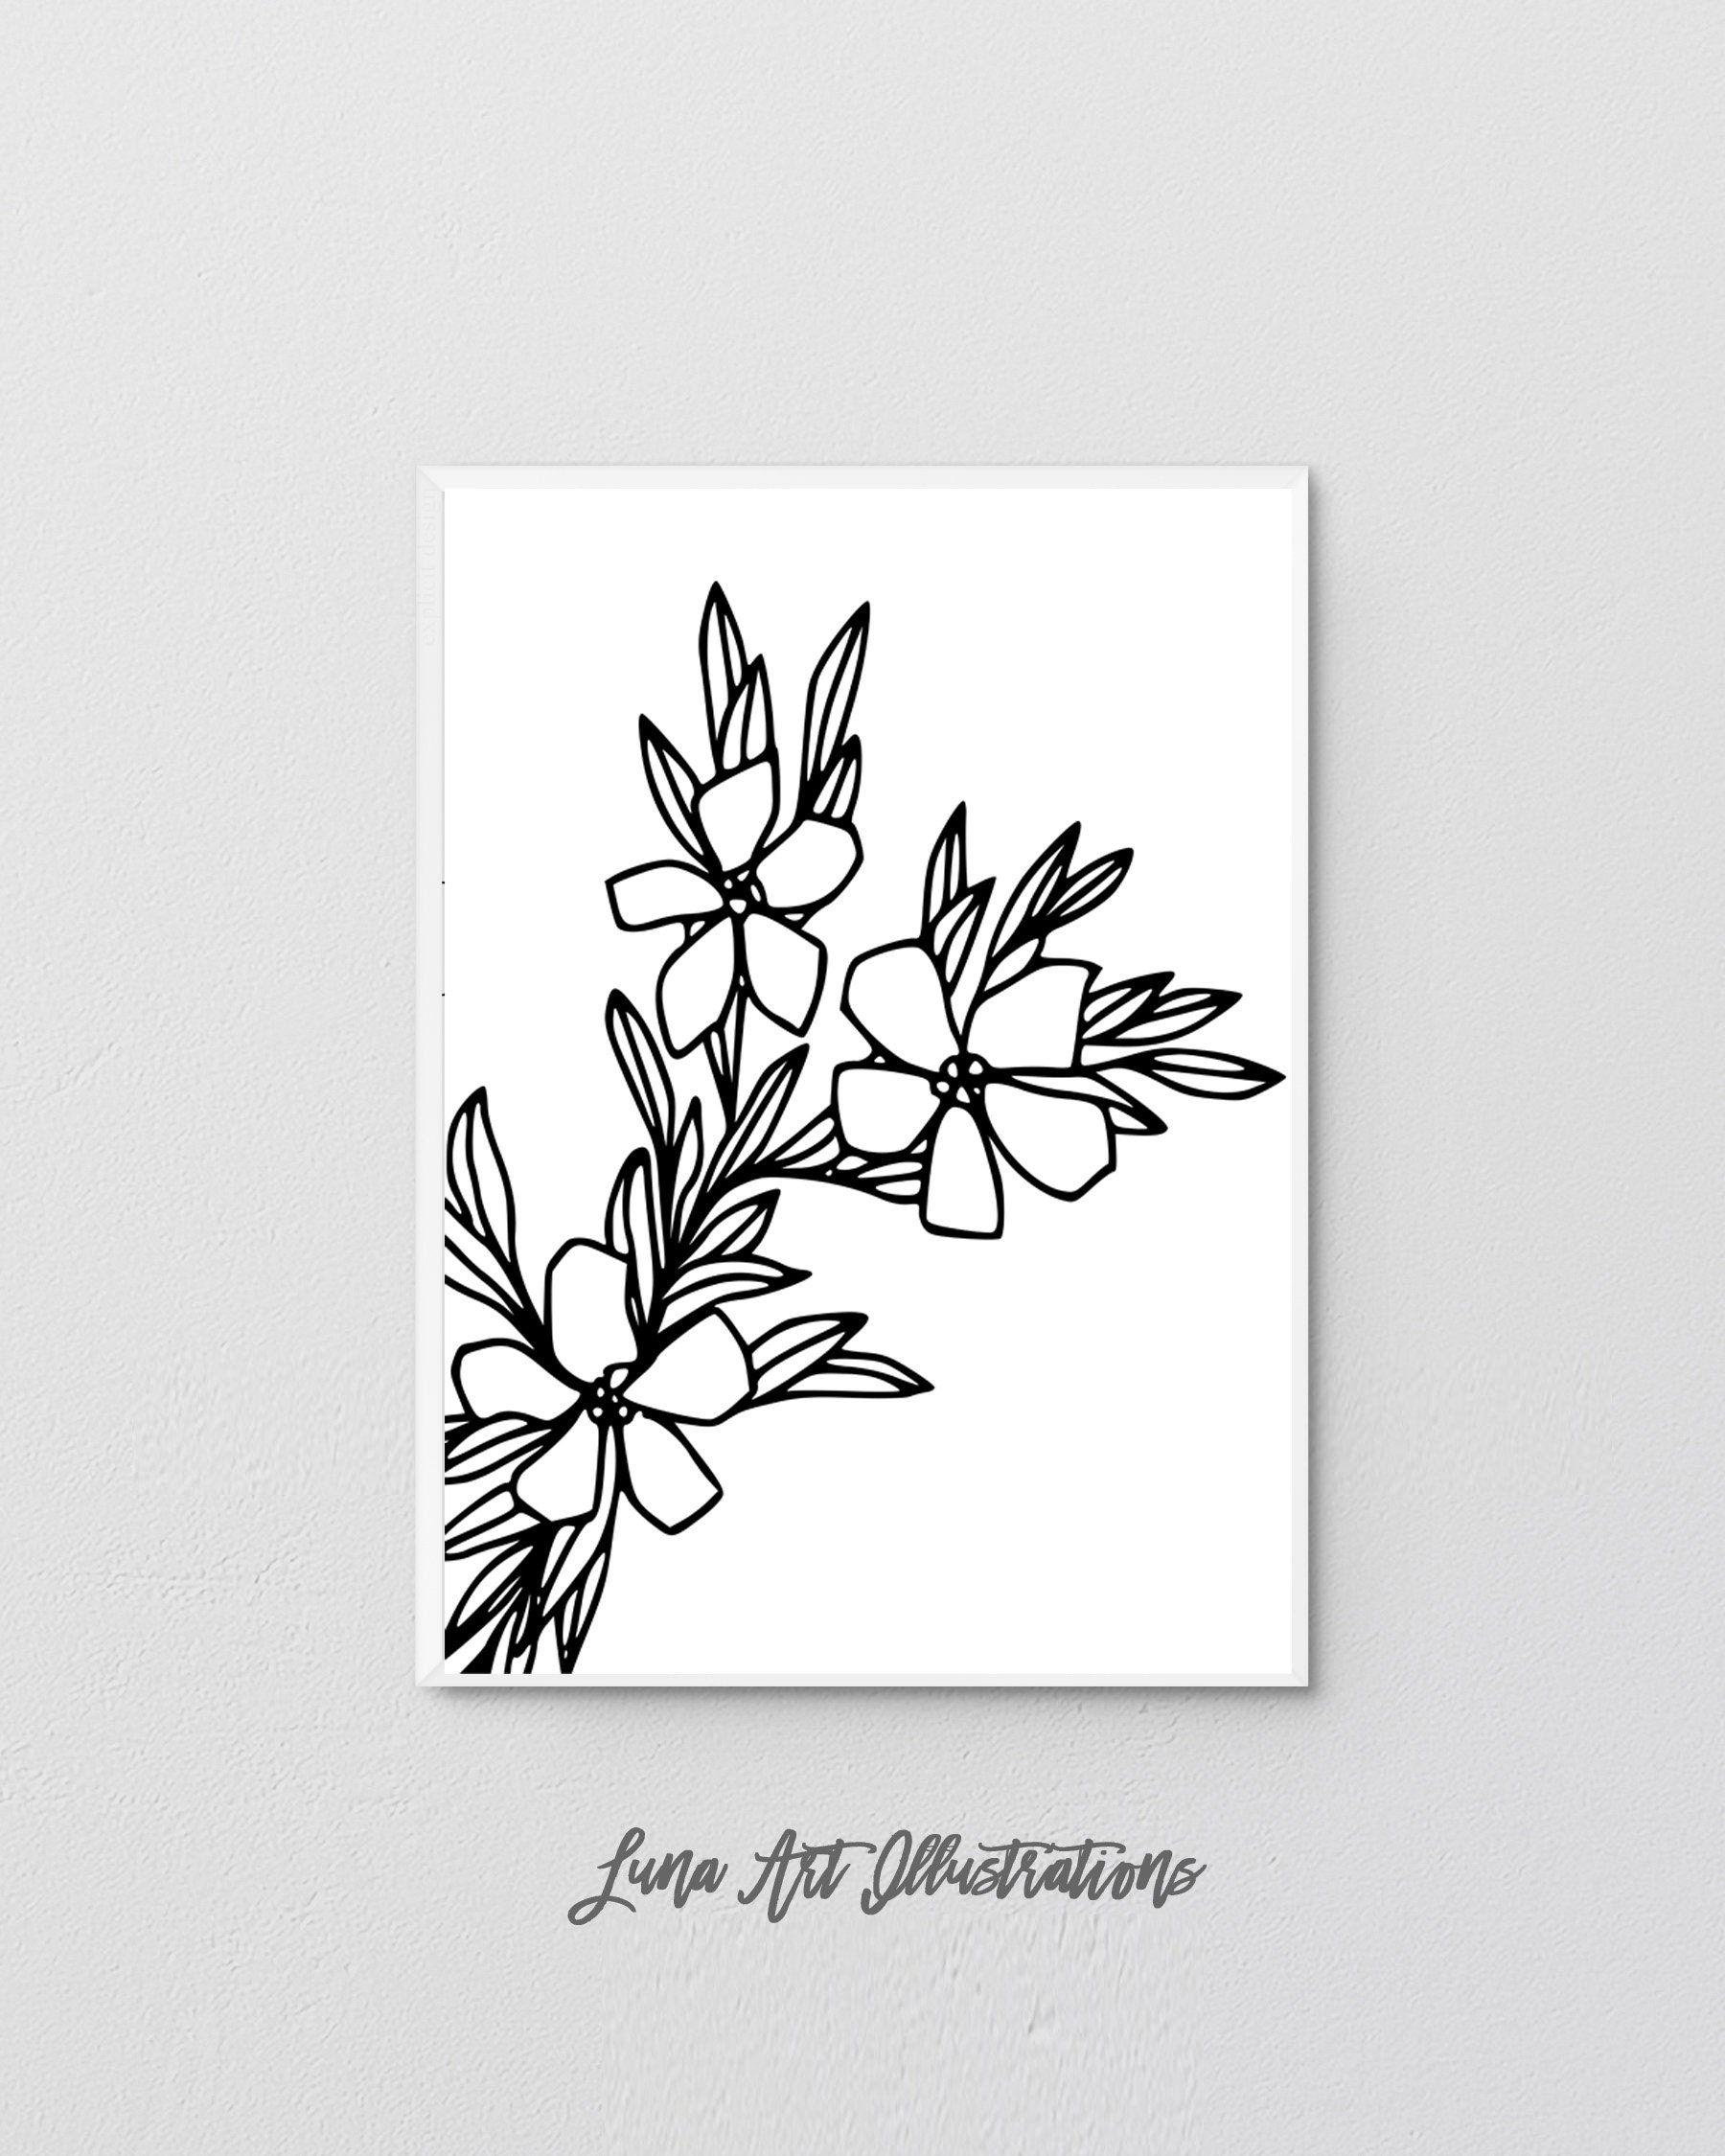 Minimalist Floral Drawing Print Botanical Line Drawing Garden Flower Wall Art Abstract One Line Sketch Plant Lovers Gift Digital Art En 2020 Dessin Floral Dessin Trait Dessin